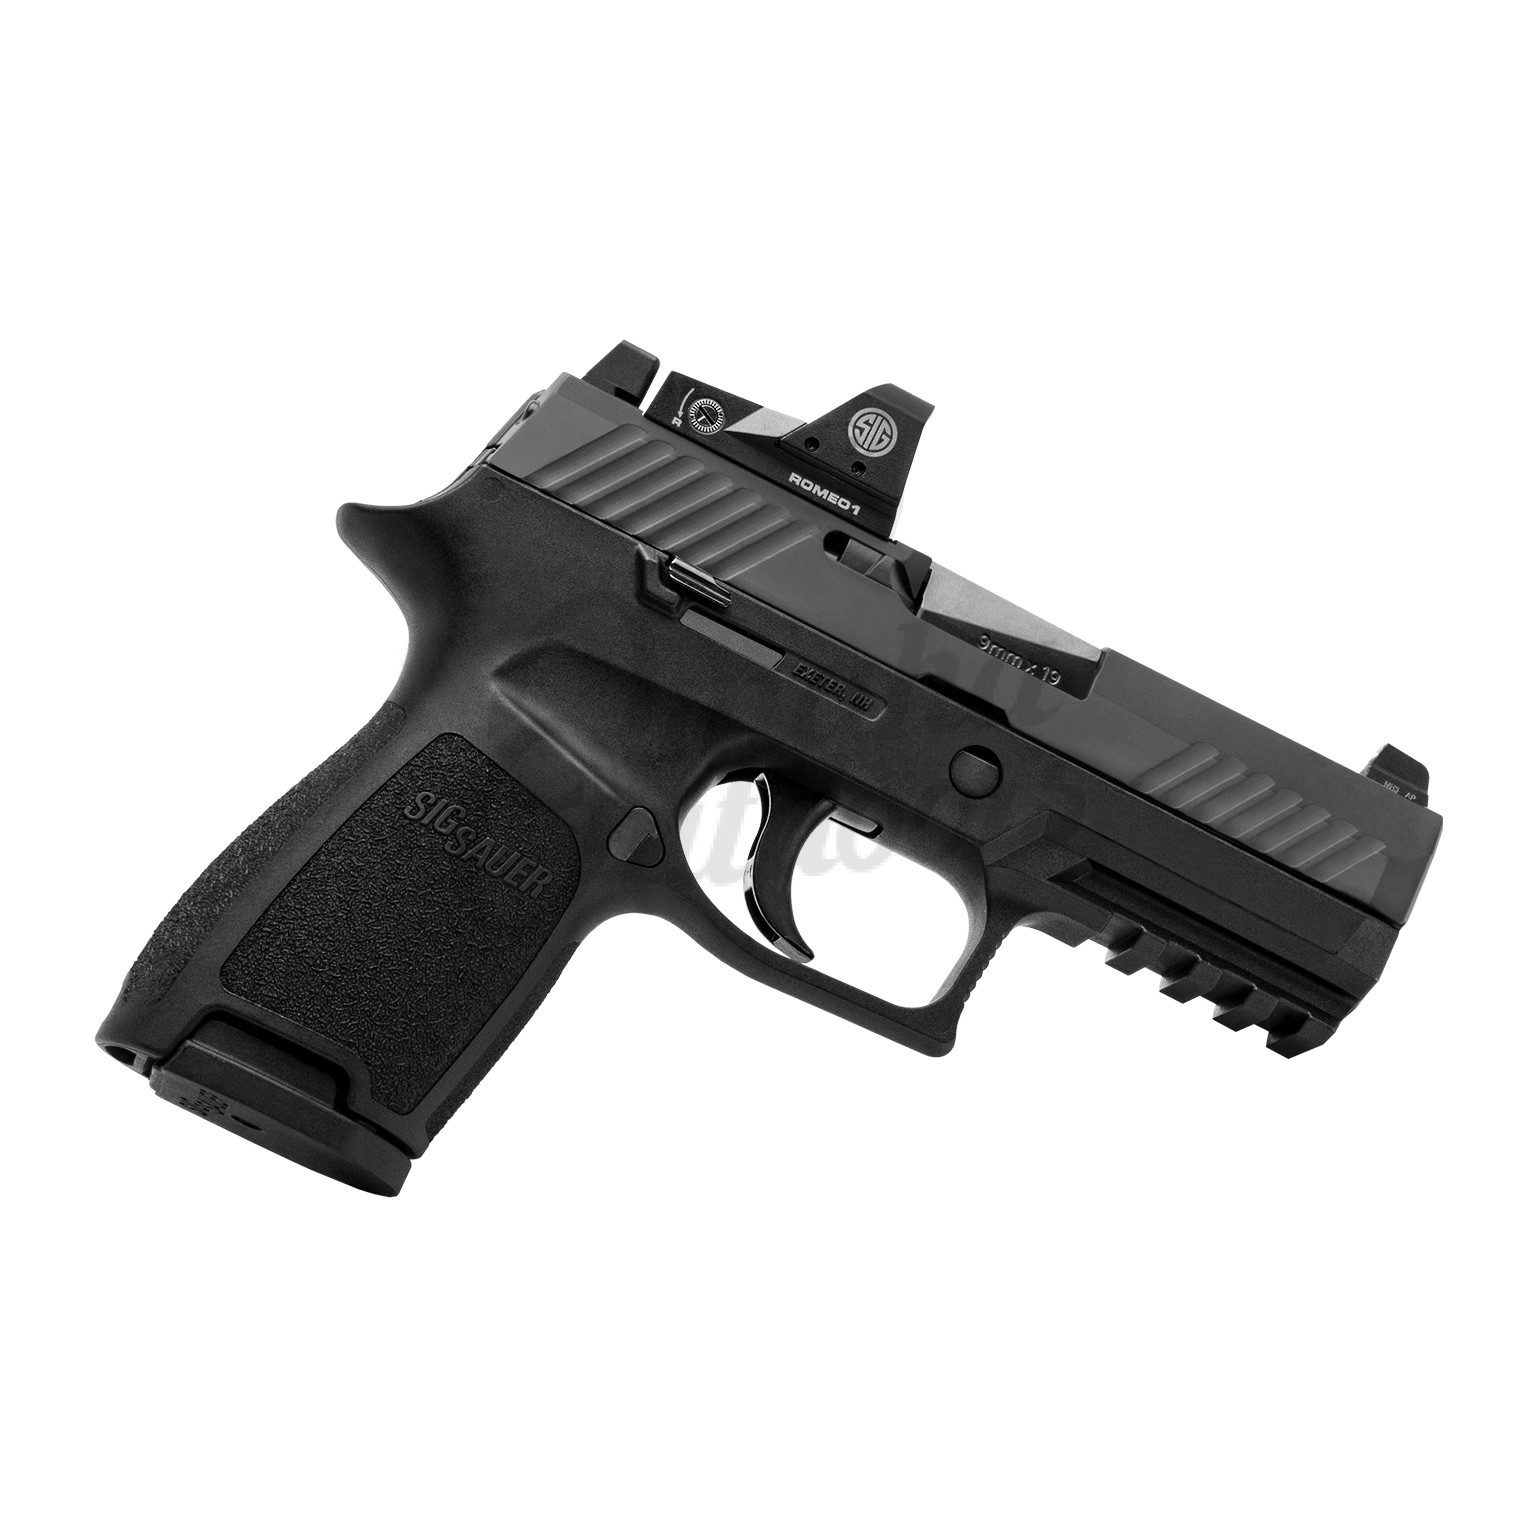 Sig Sauer P320 RX Compact Pistol 9mm 15 RD Night Sights Romeo 1 Reflex  320C-9-BSS-RX